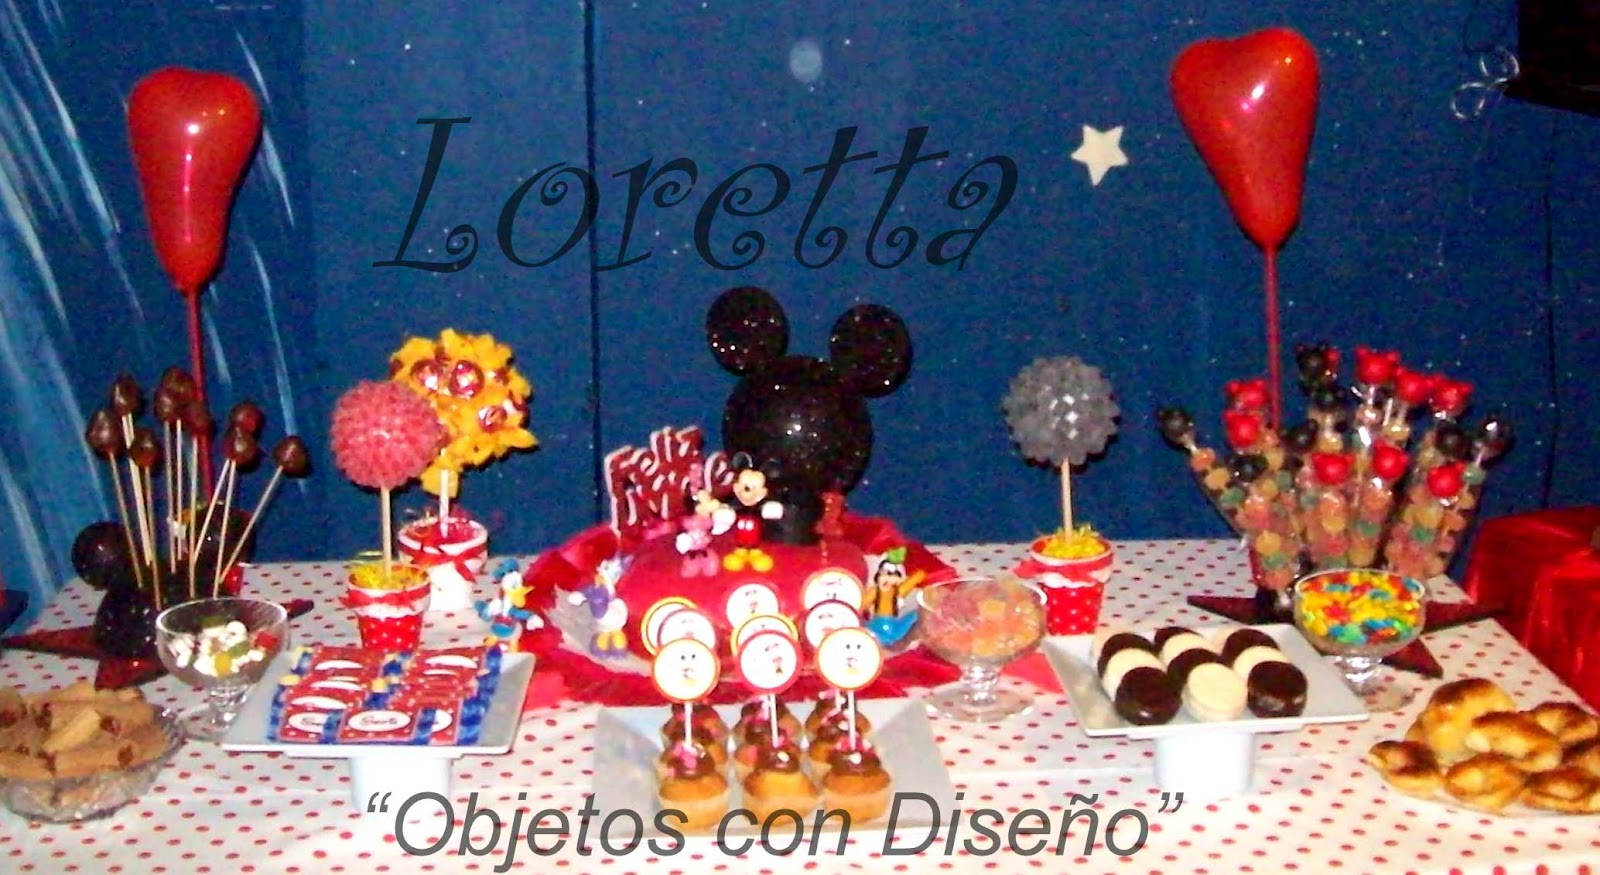 Loretta objetos con dise o decoraci n tem tica mickey - Objetos decoracion diseno ...